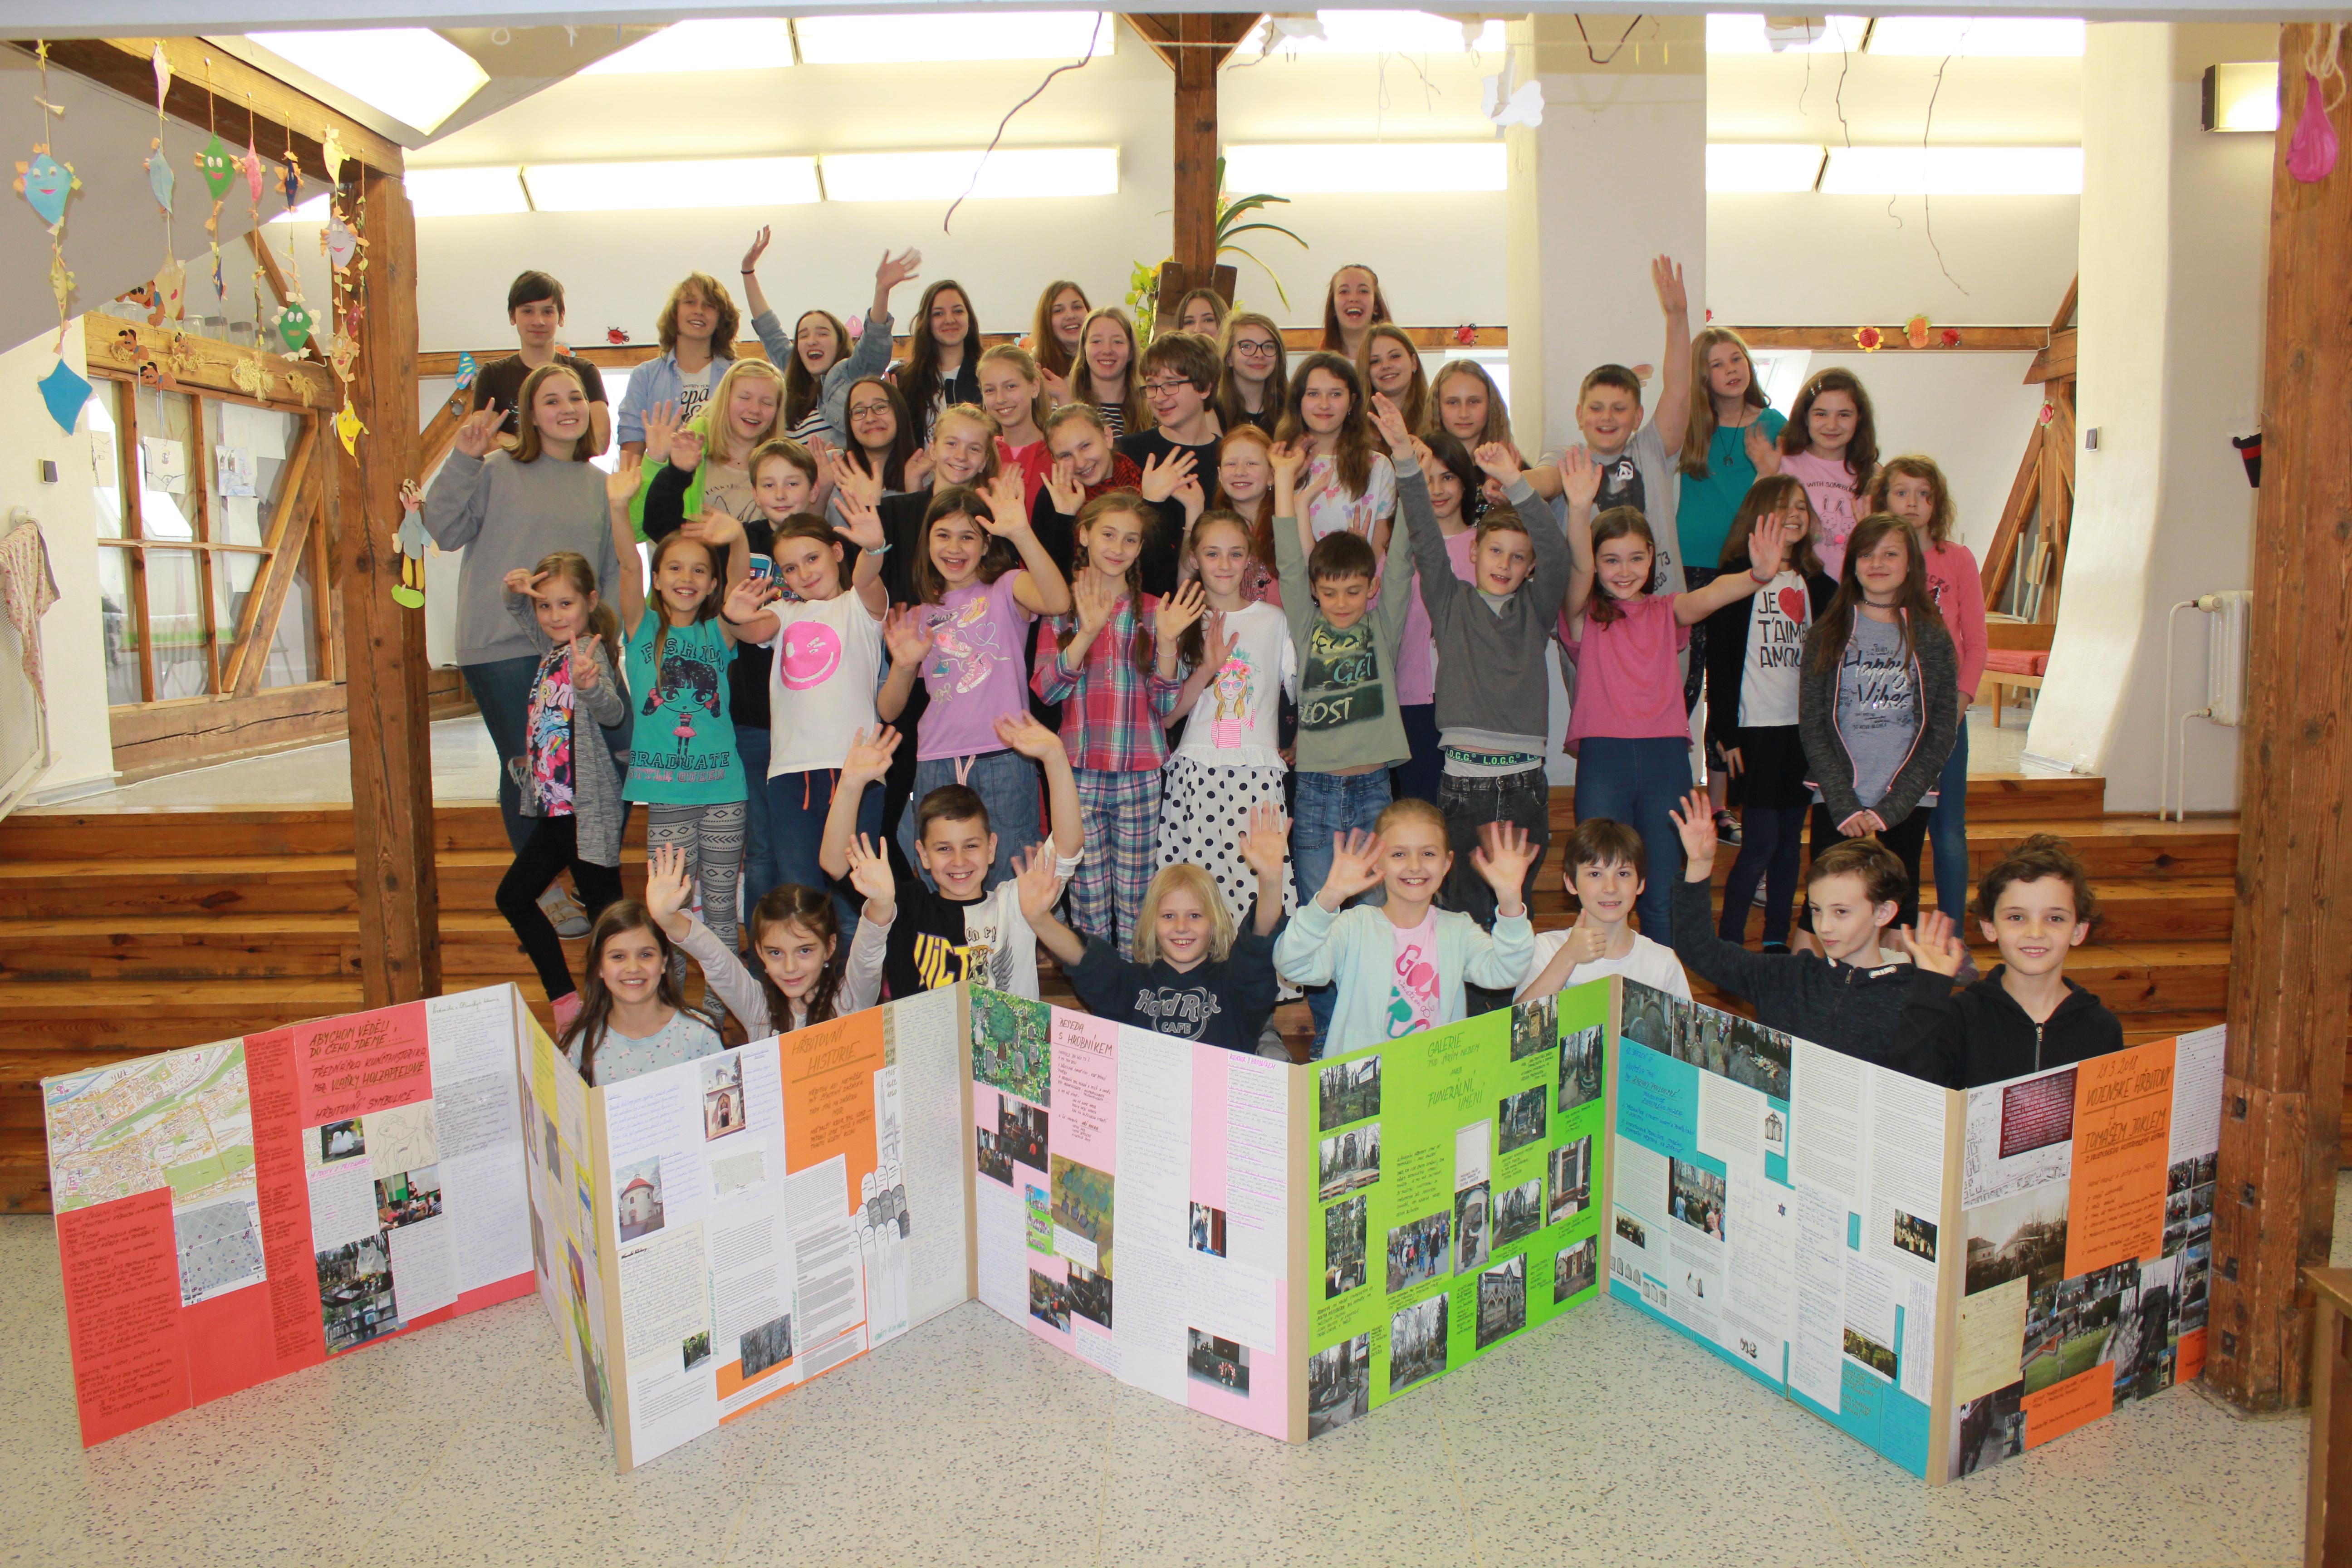 Žáci ZŠ J. Seiferta navštívili Městskou knihovnu v Praze 3